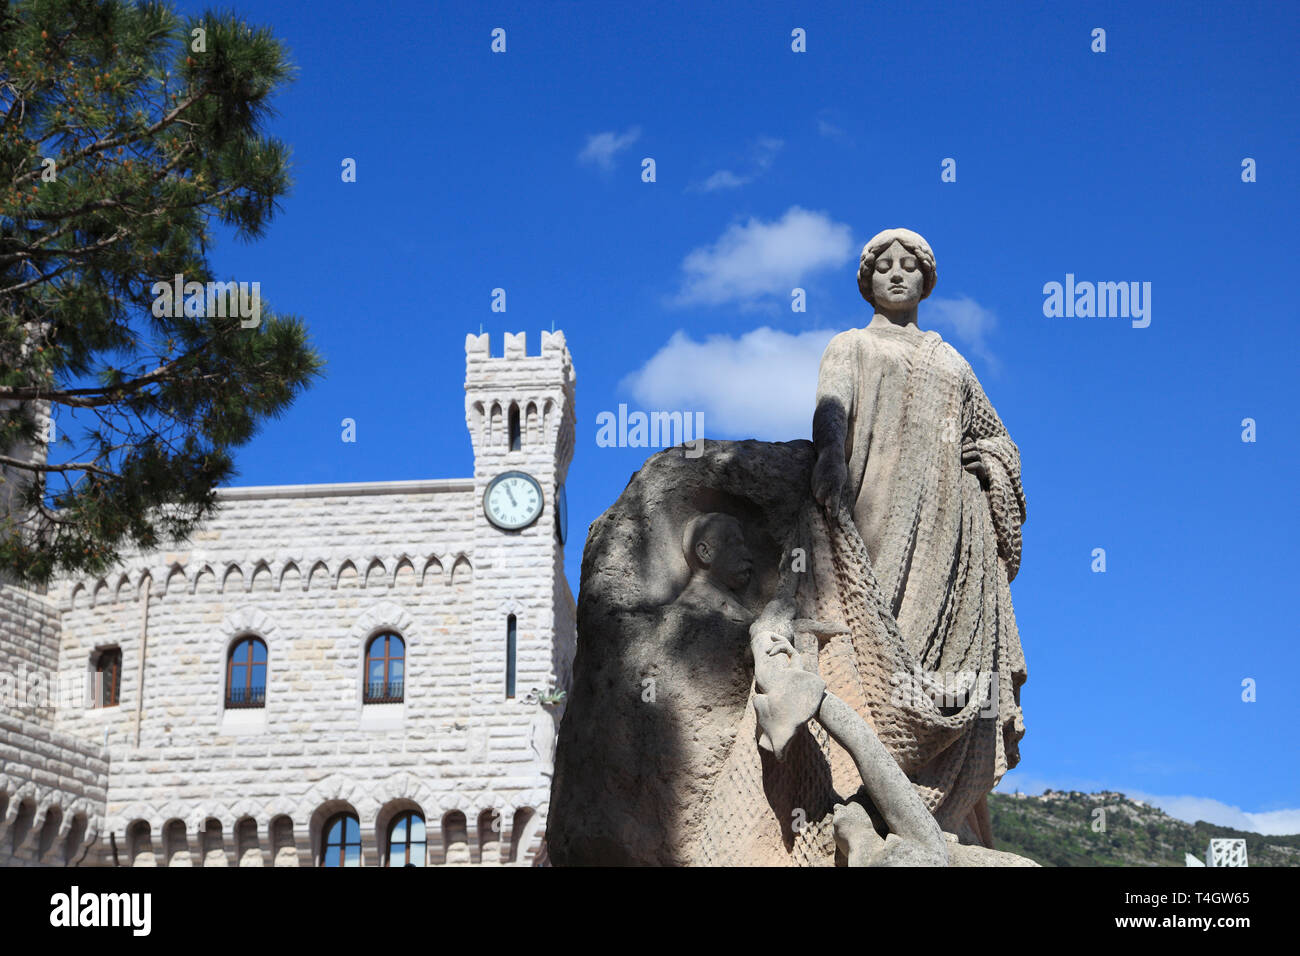 Prince Albert I Statue, Princes of Grimaldi Palace, Royal Palace, Monaco, Cote d Azur, Mediterranean, Europe - Stock Image